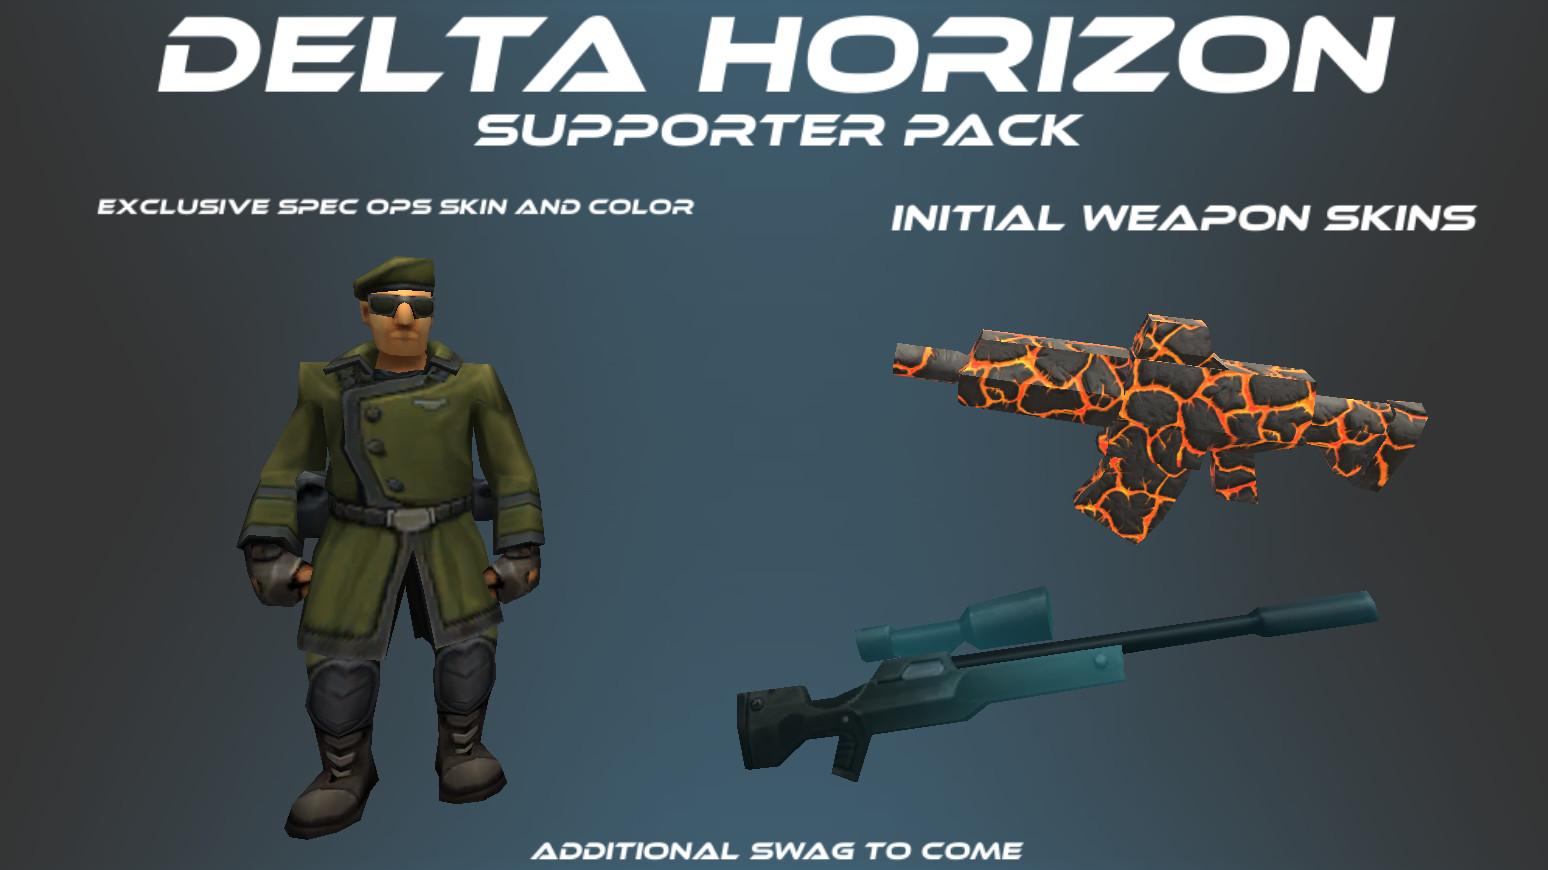 Delta Horizon - Supporter Pack